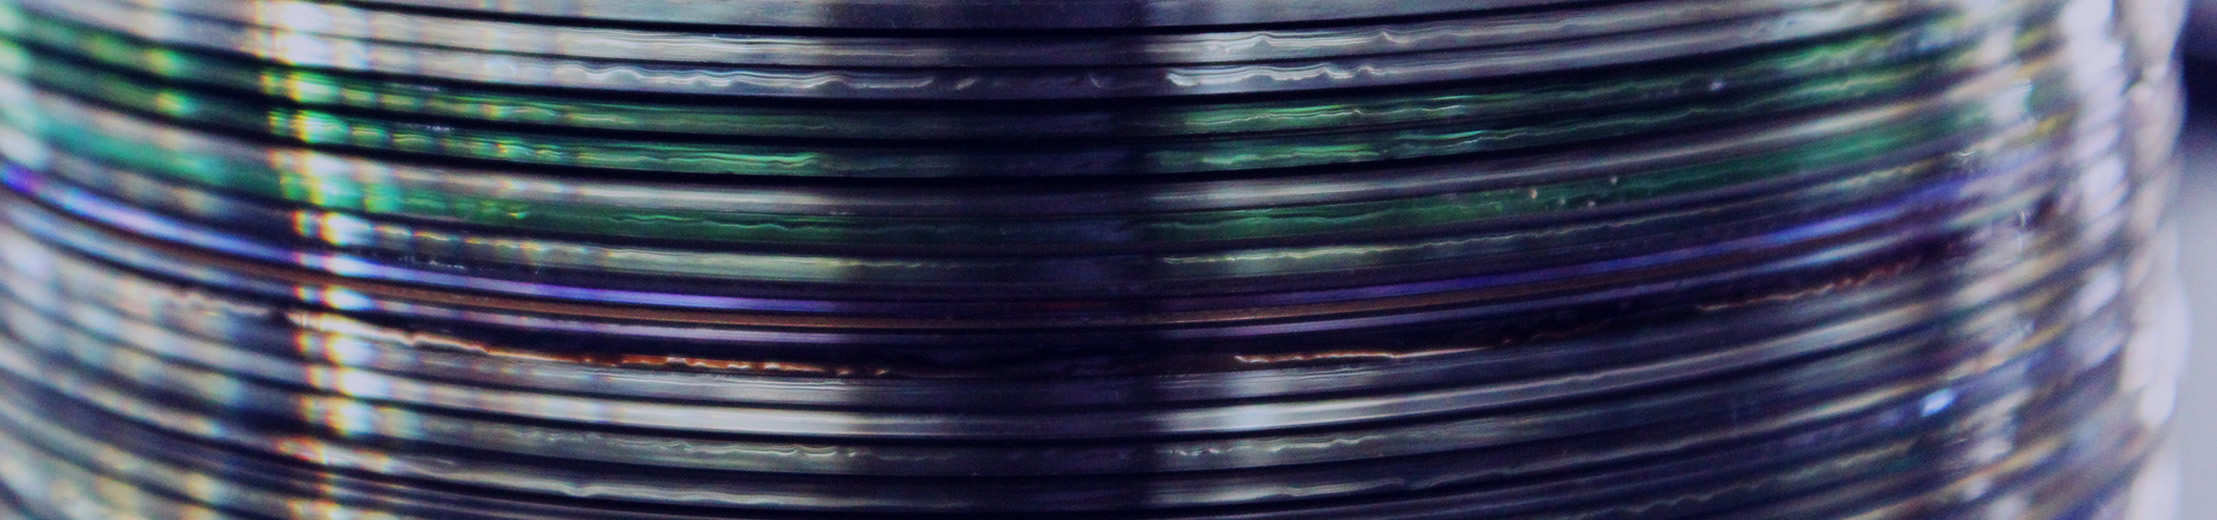 cilindro-2-1